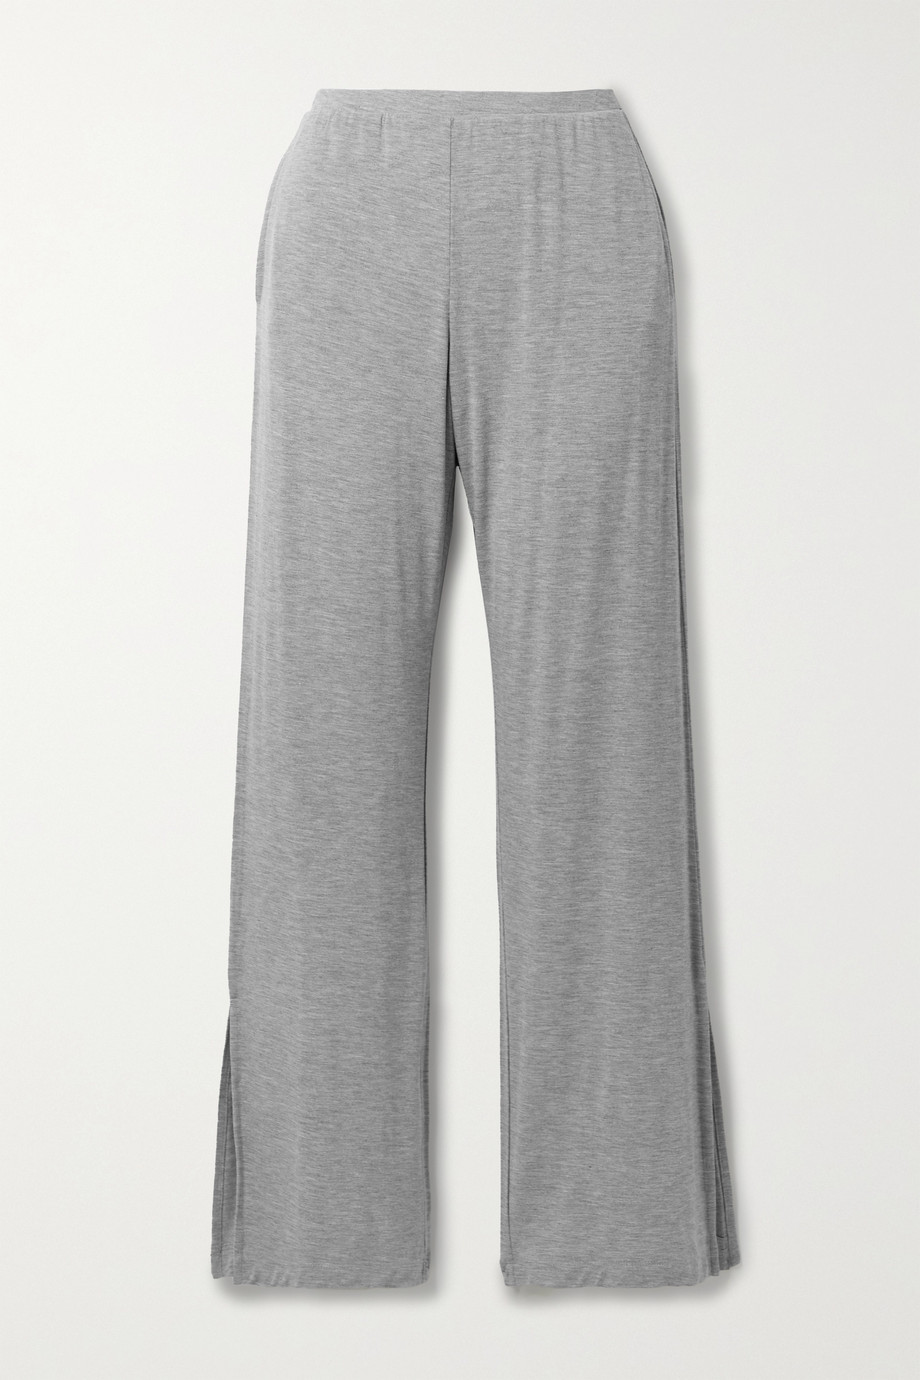 Skin Lumi mélange stretch-jersey pajama pants